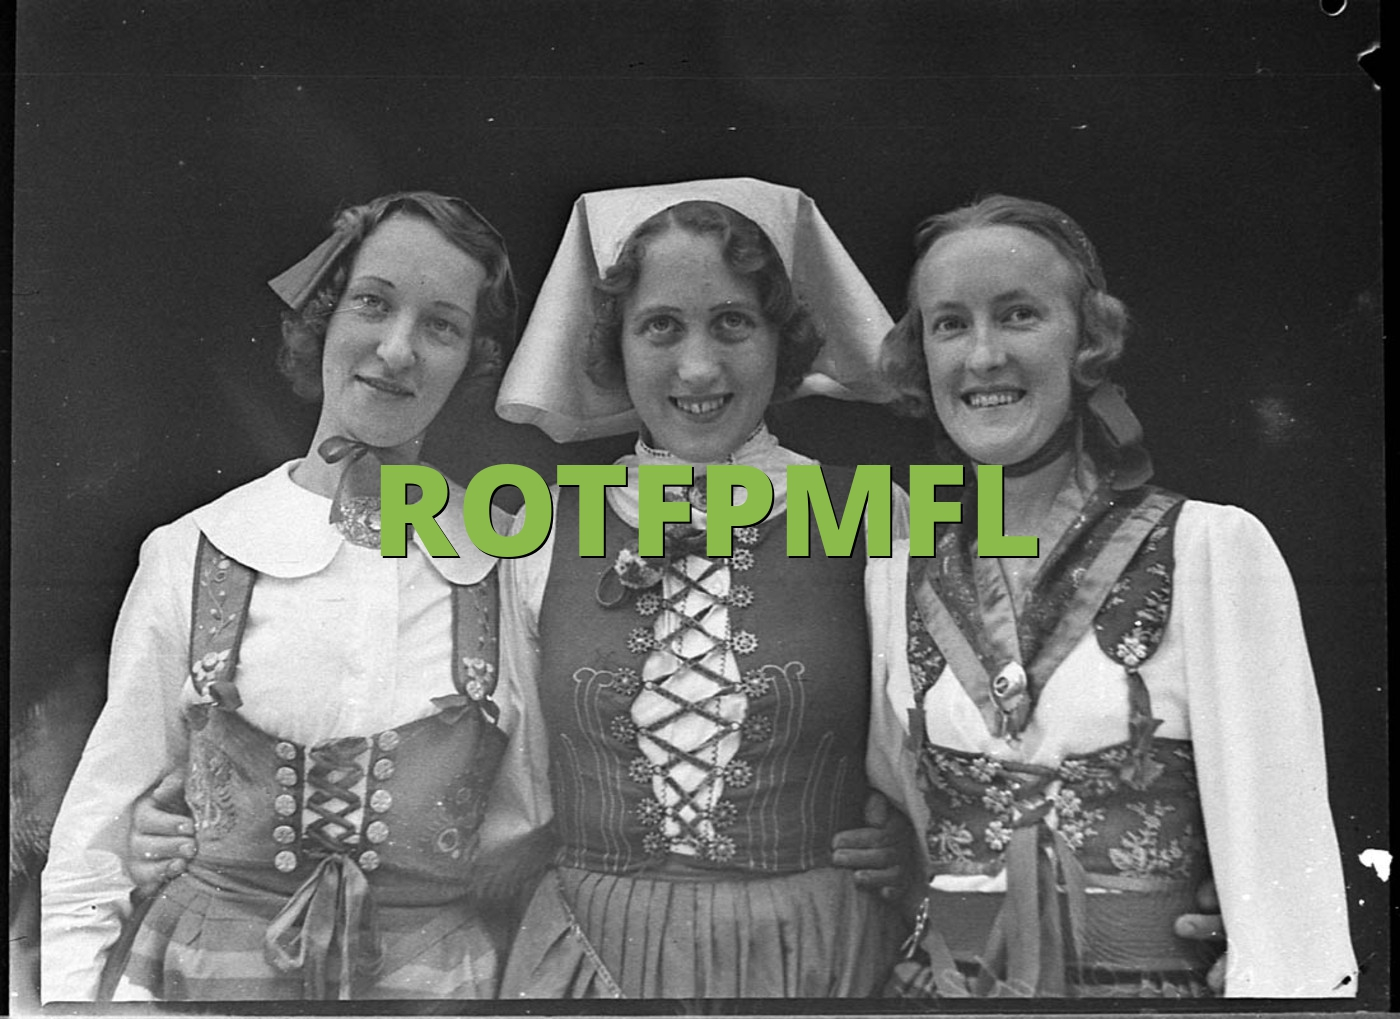 ROTFPMFL